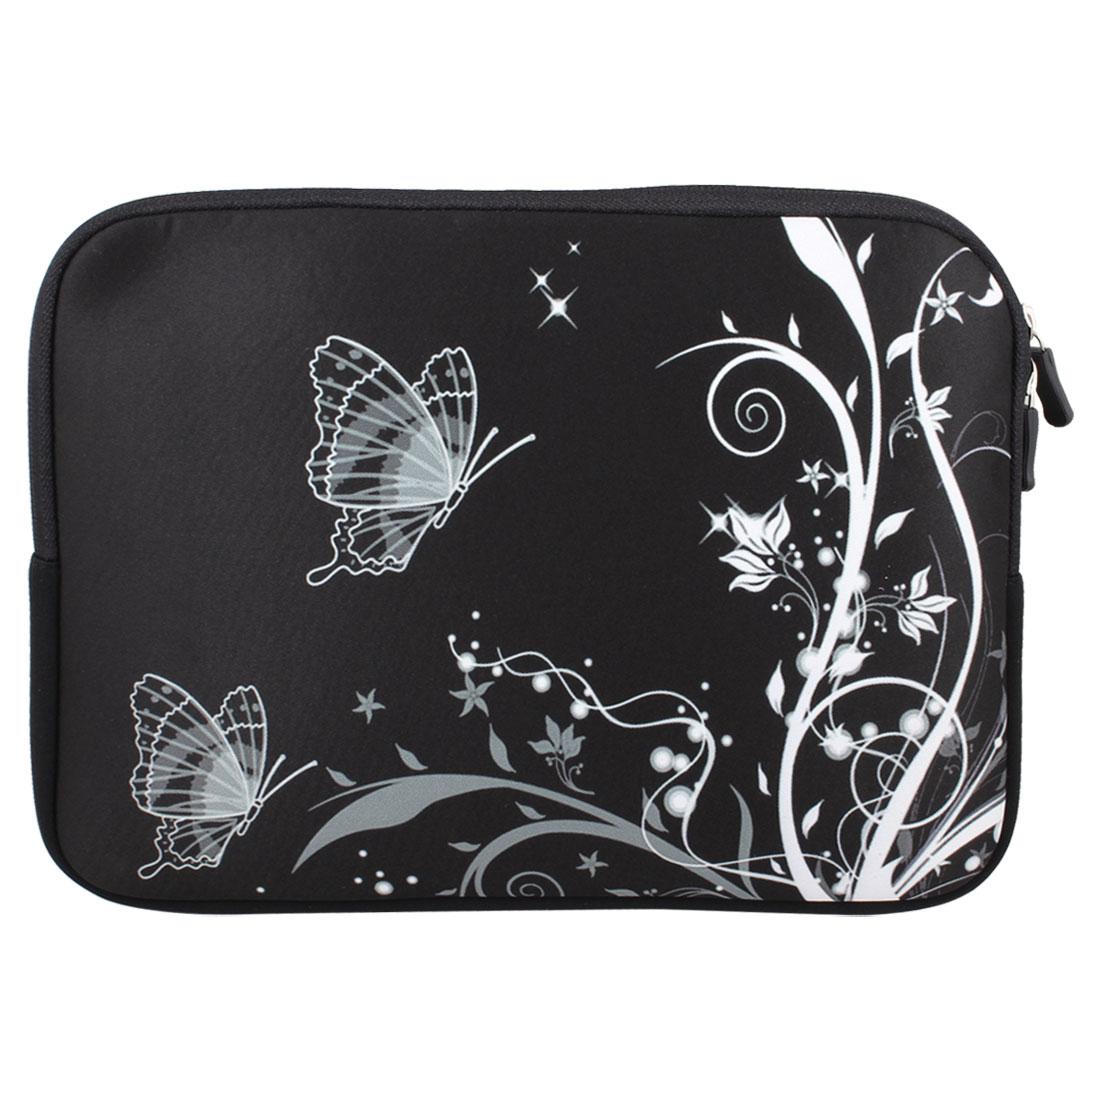 "Butterfly 10"" 10.1"" 10.2"" Neoprene Notebook Laptop Sleeve Bag Case"